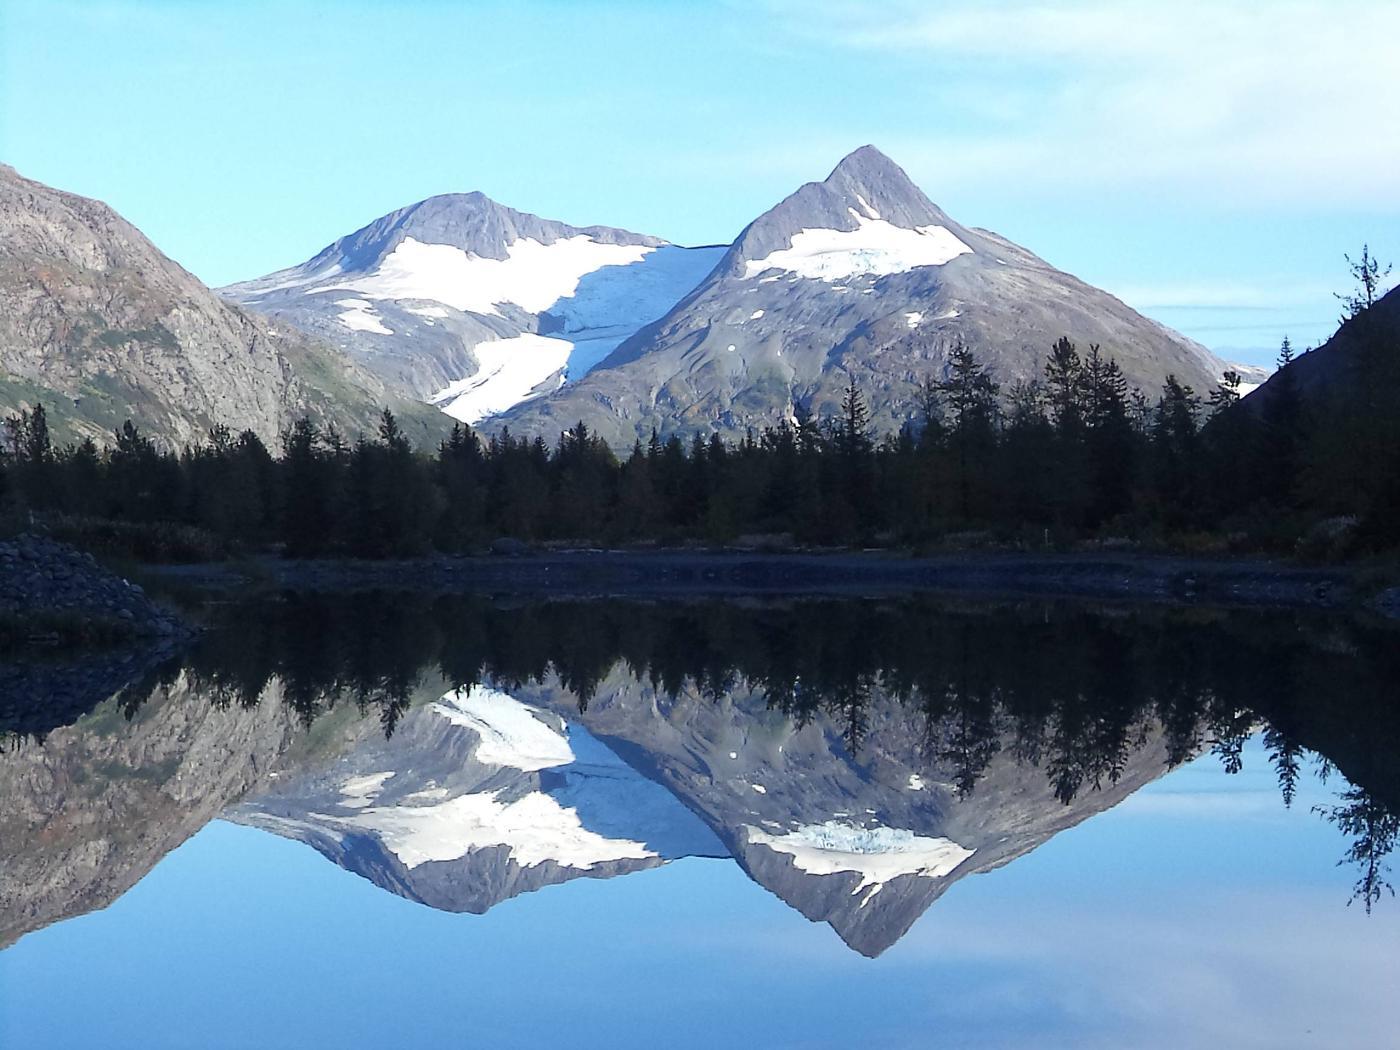 Bard Peak ReflectionChugach National Forest, Alaska